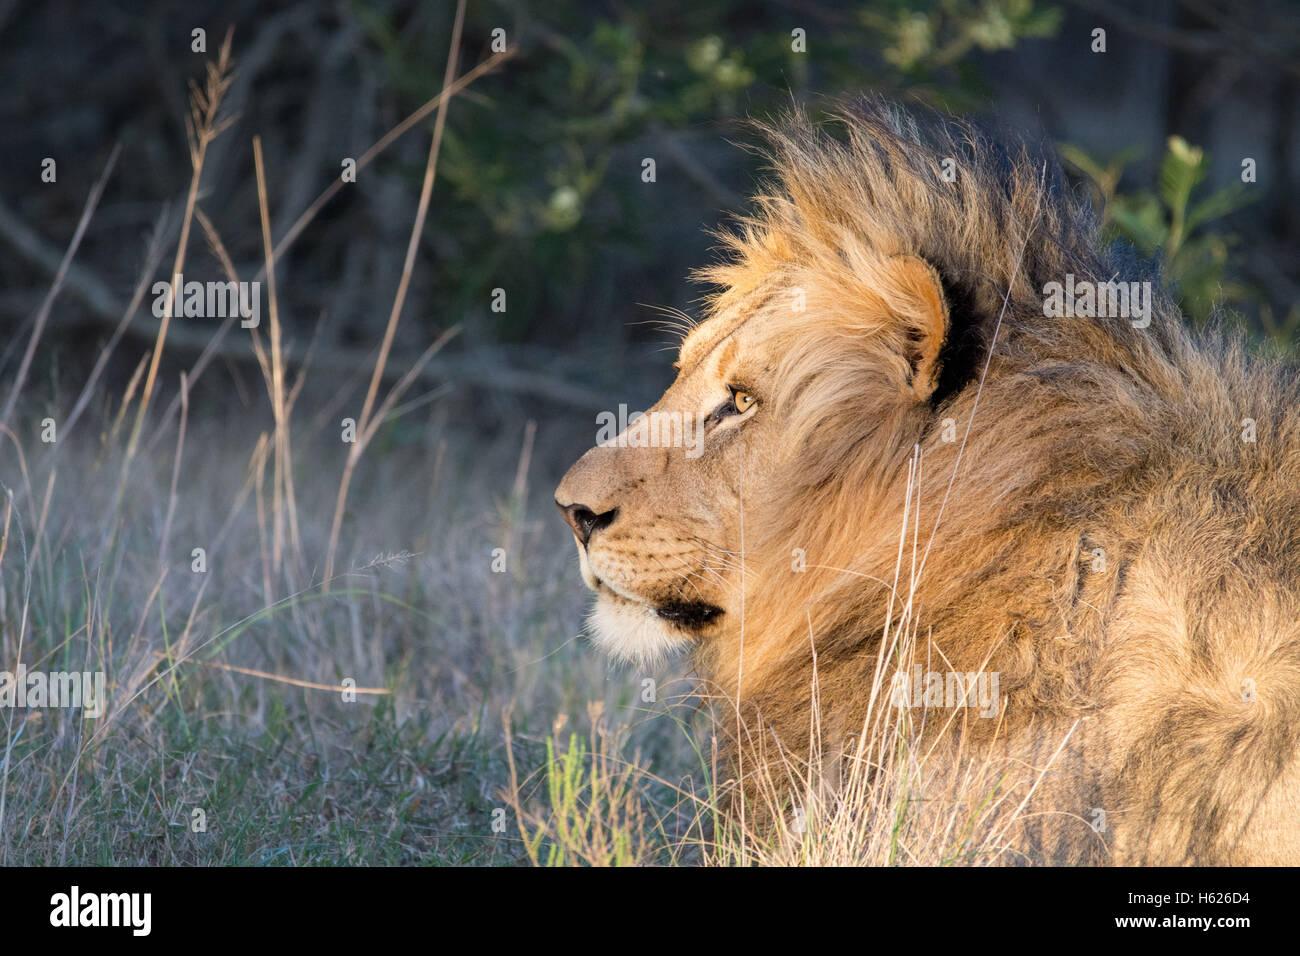 Lion resting, enjoying the setting sun. - Stock Image